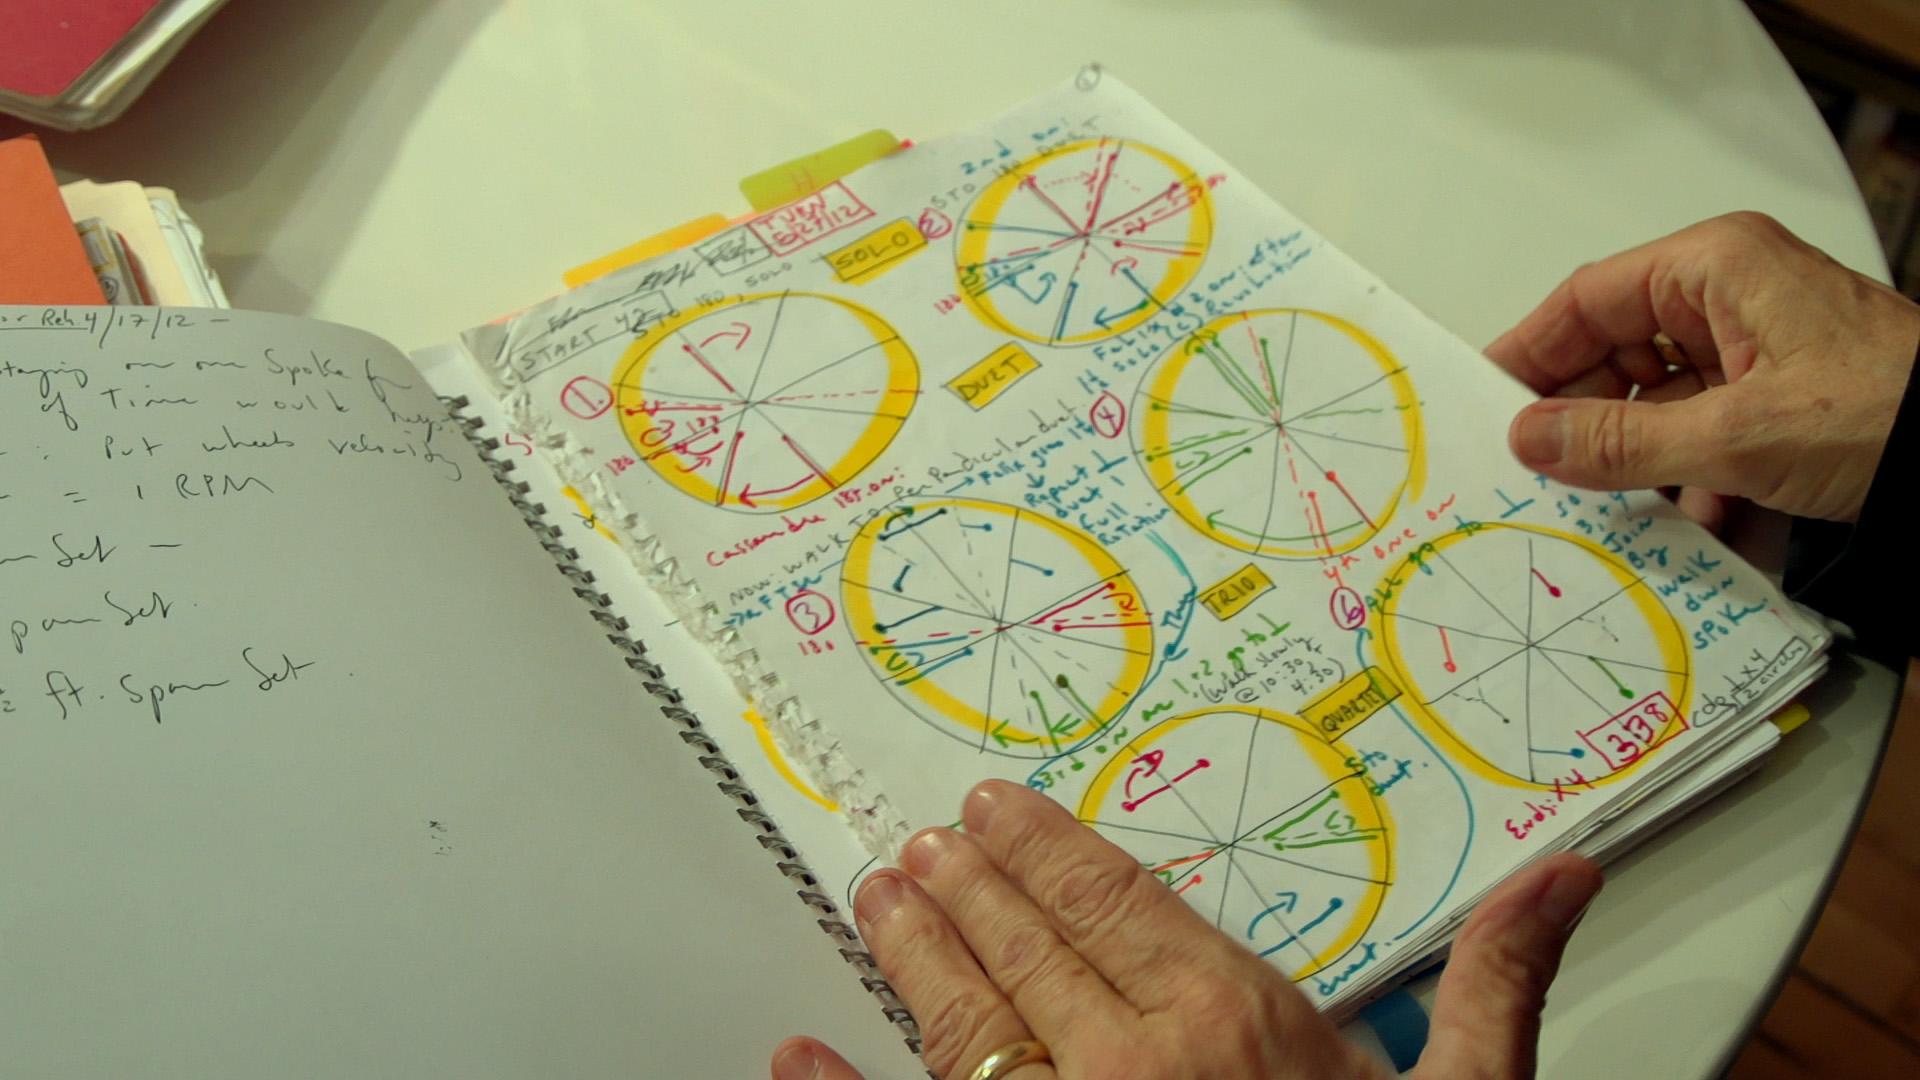 Elizabeth Streb's choreography sketchbook.